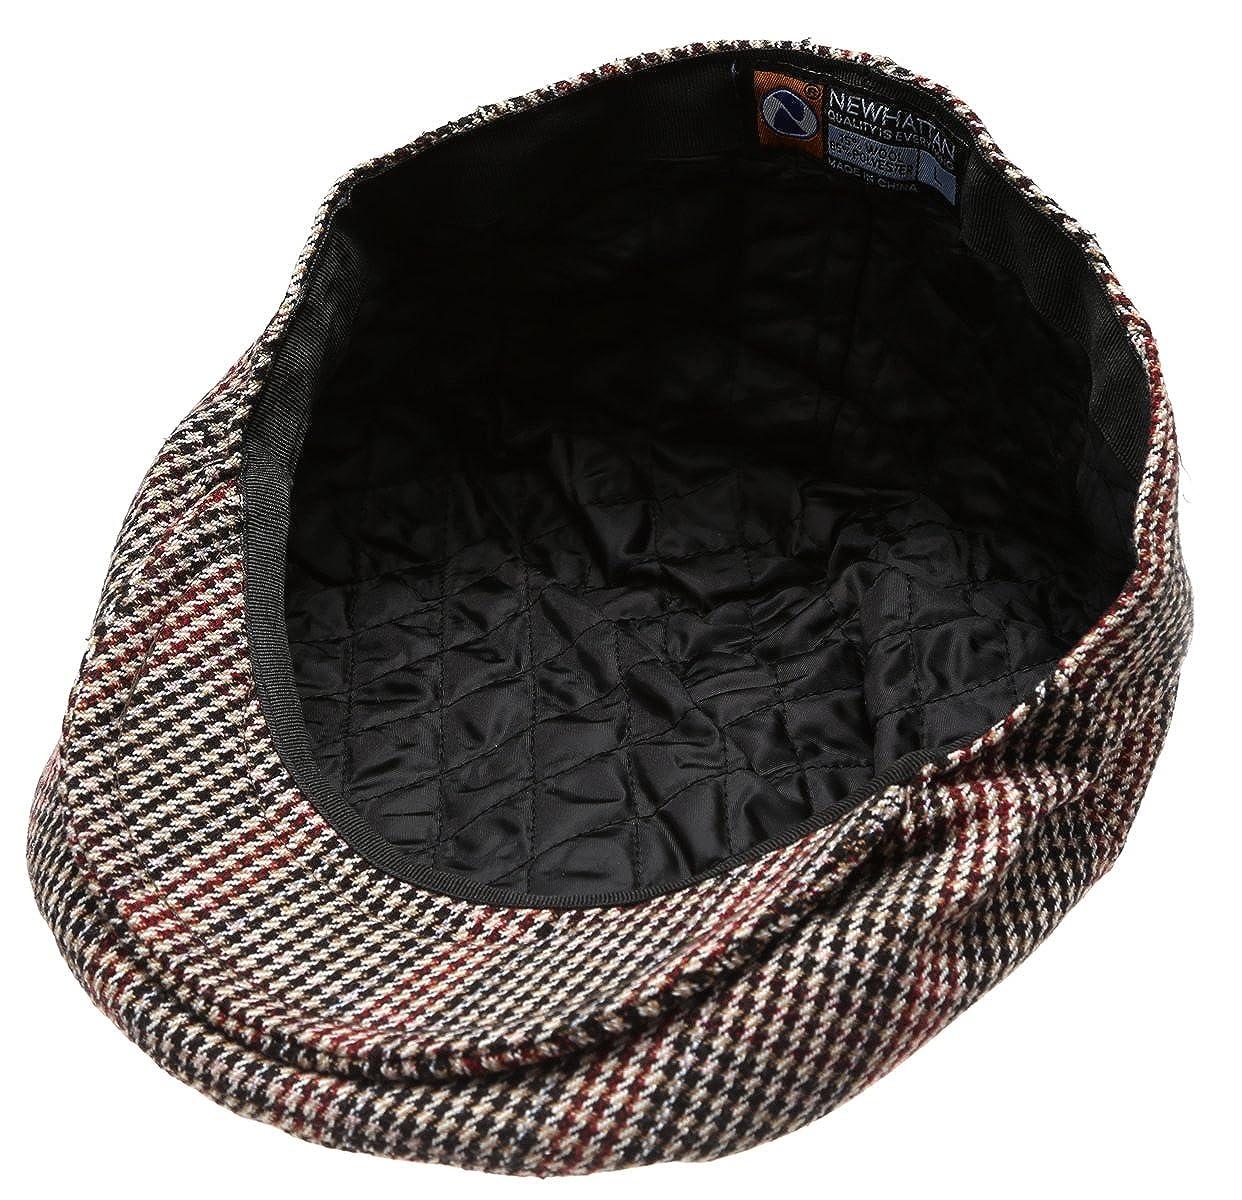 Mens Collection Wool Blend Herringbone Tweed Newsboy Ivy Hat with Dress Socks.